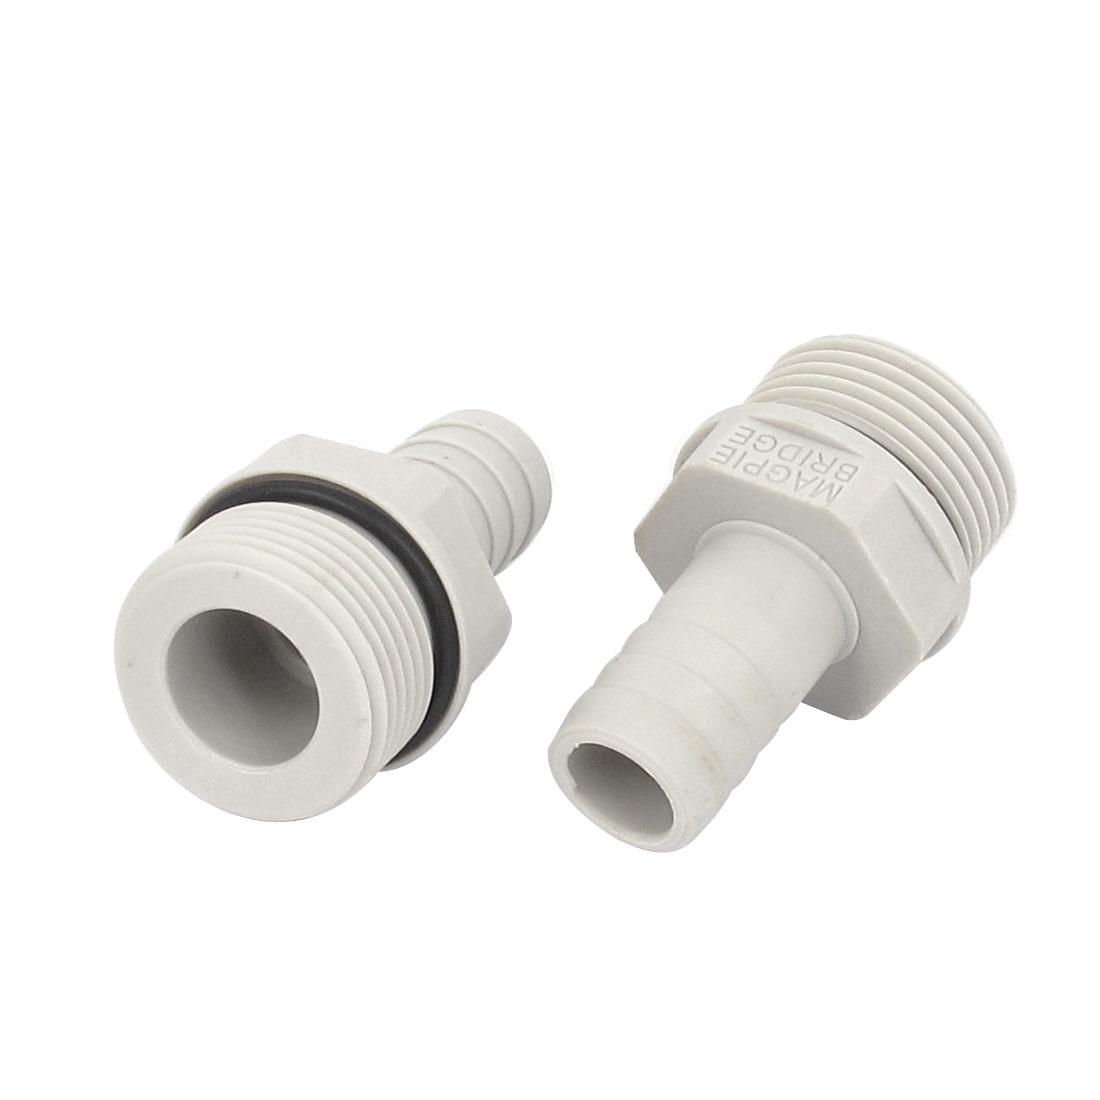 3/4BSP Male Thread 14mm Inner Dia Air Pneumatic Plastic Hose Barb Coupler 2pcs